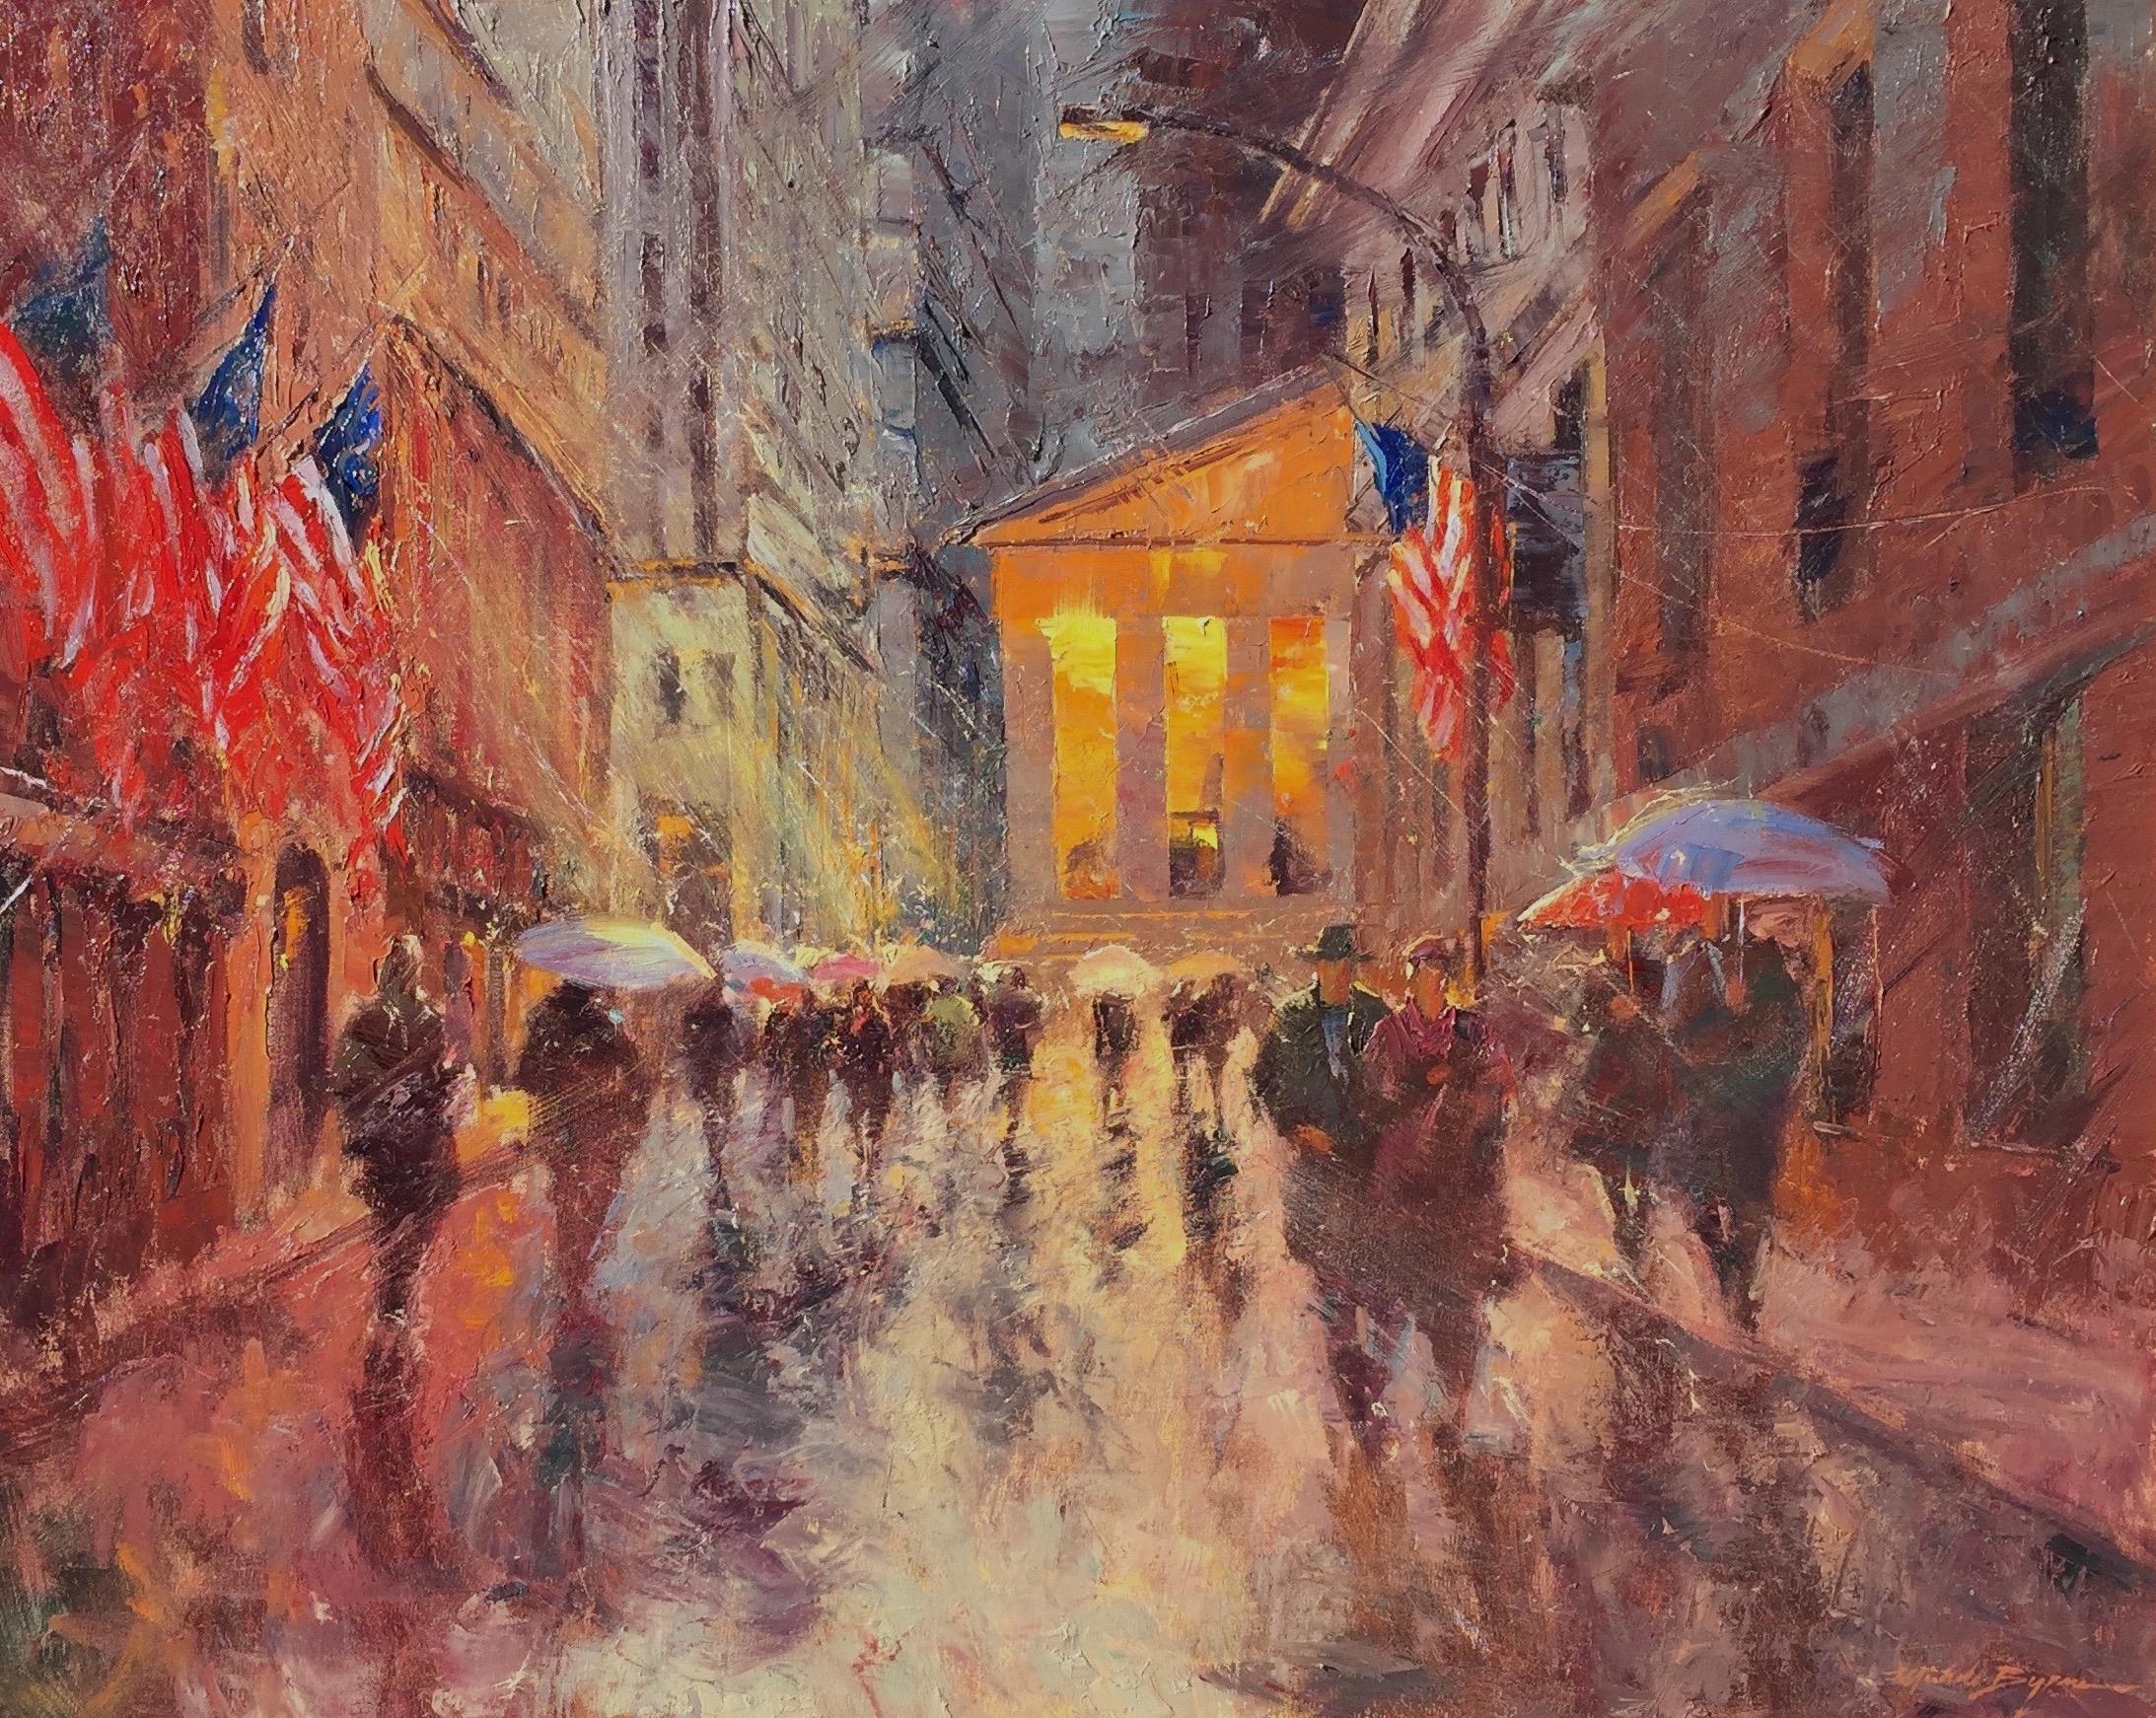 byrne-rainyeveningonwallstreet-2430-cropped